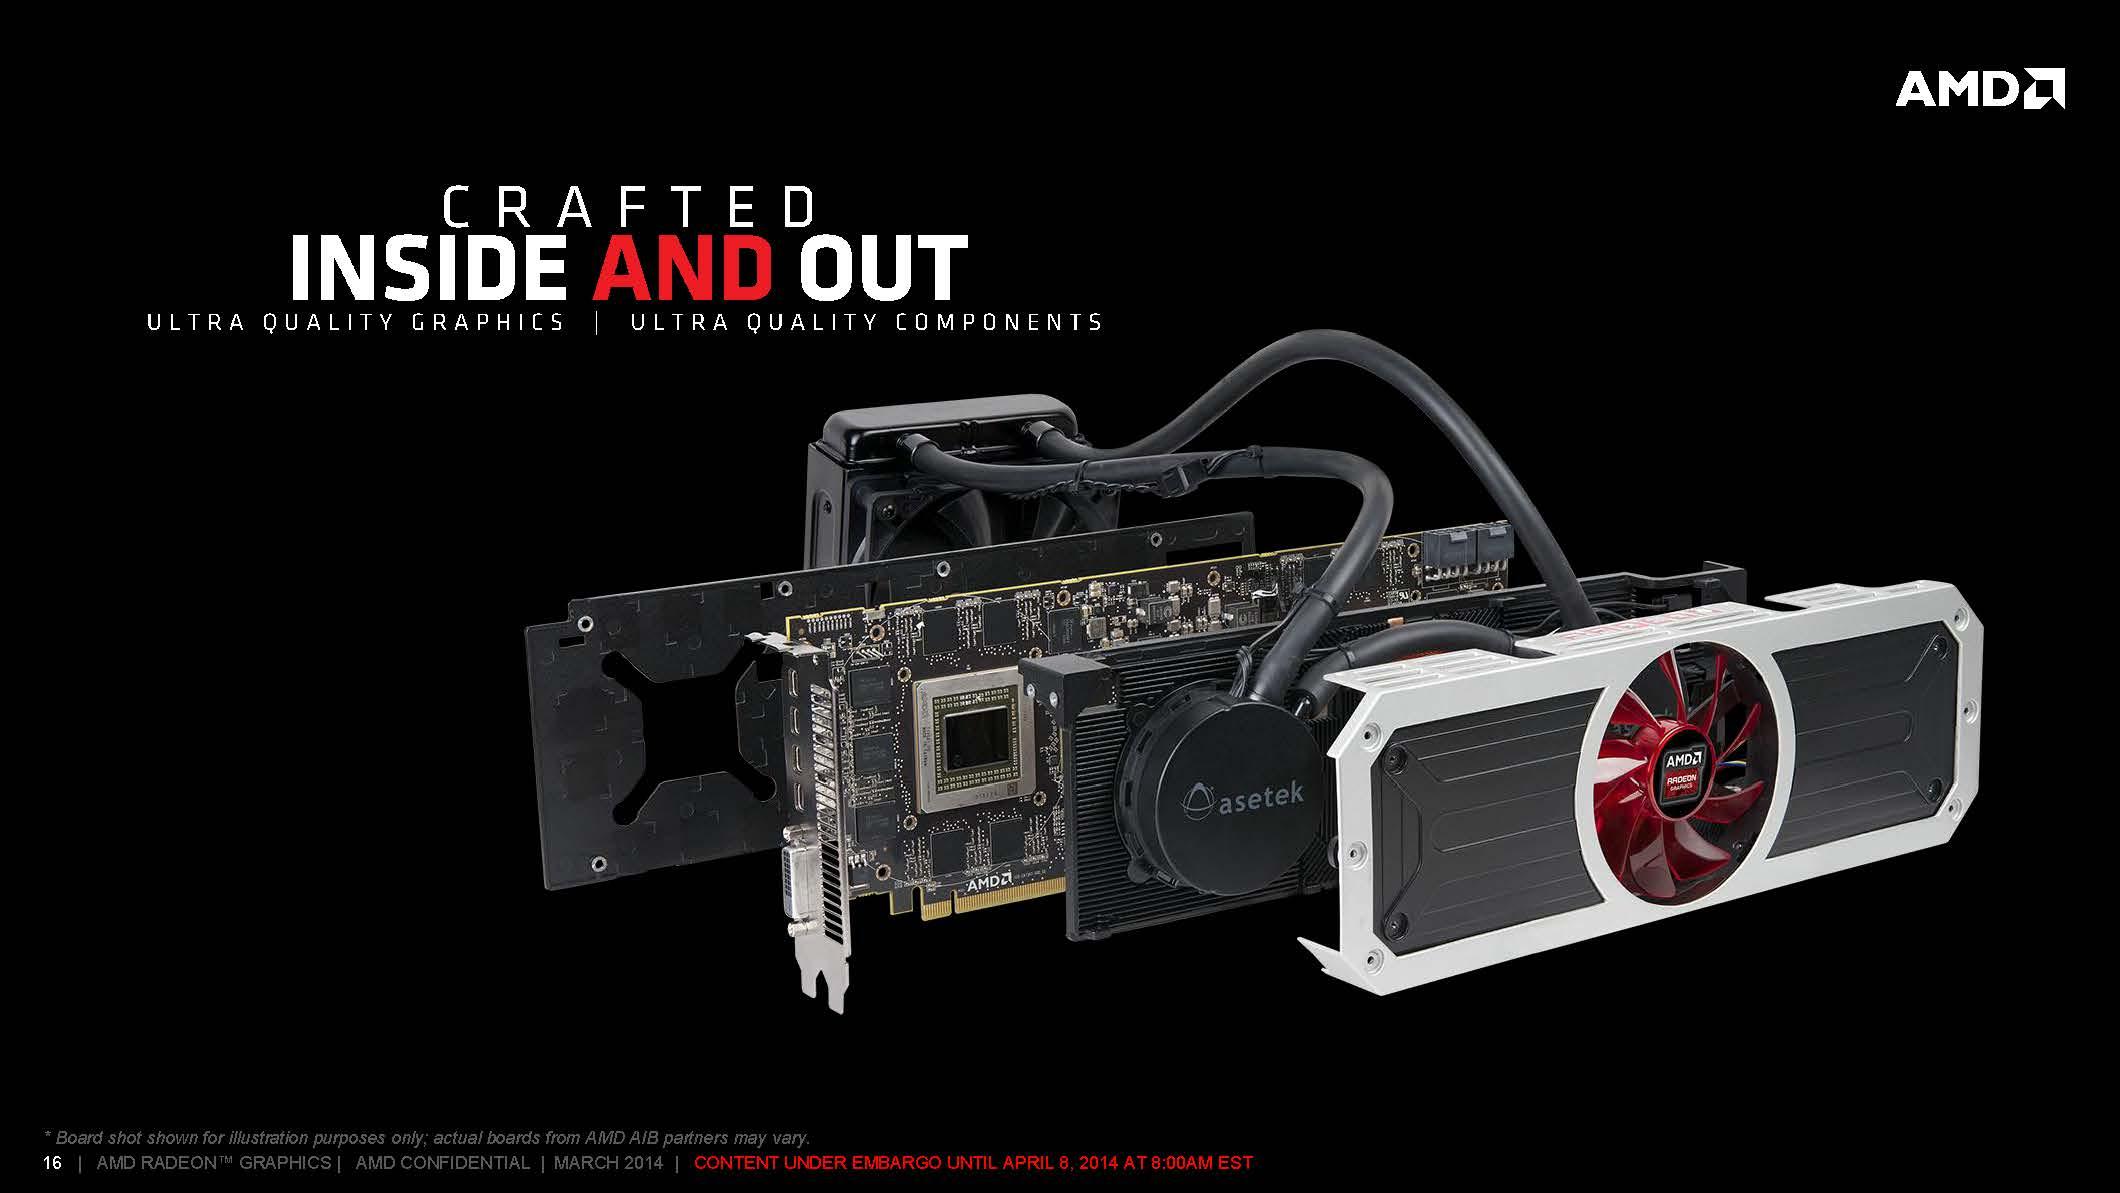 AMD launches Radeon R9 295X2 | VideoCardz.com